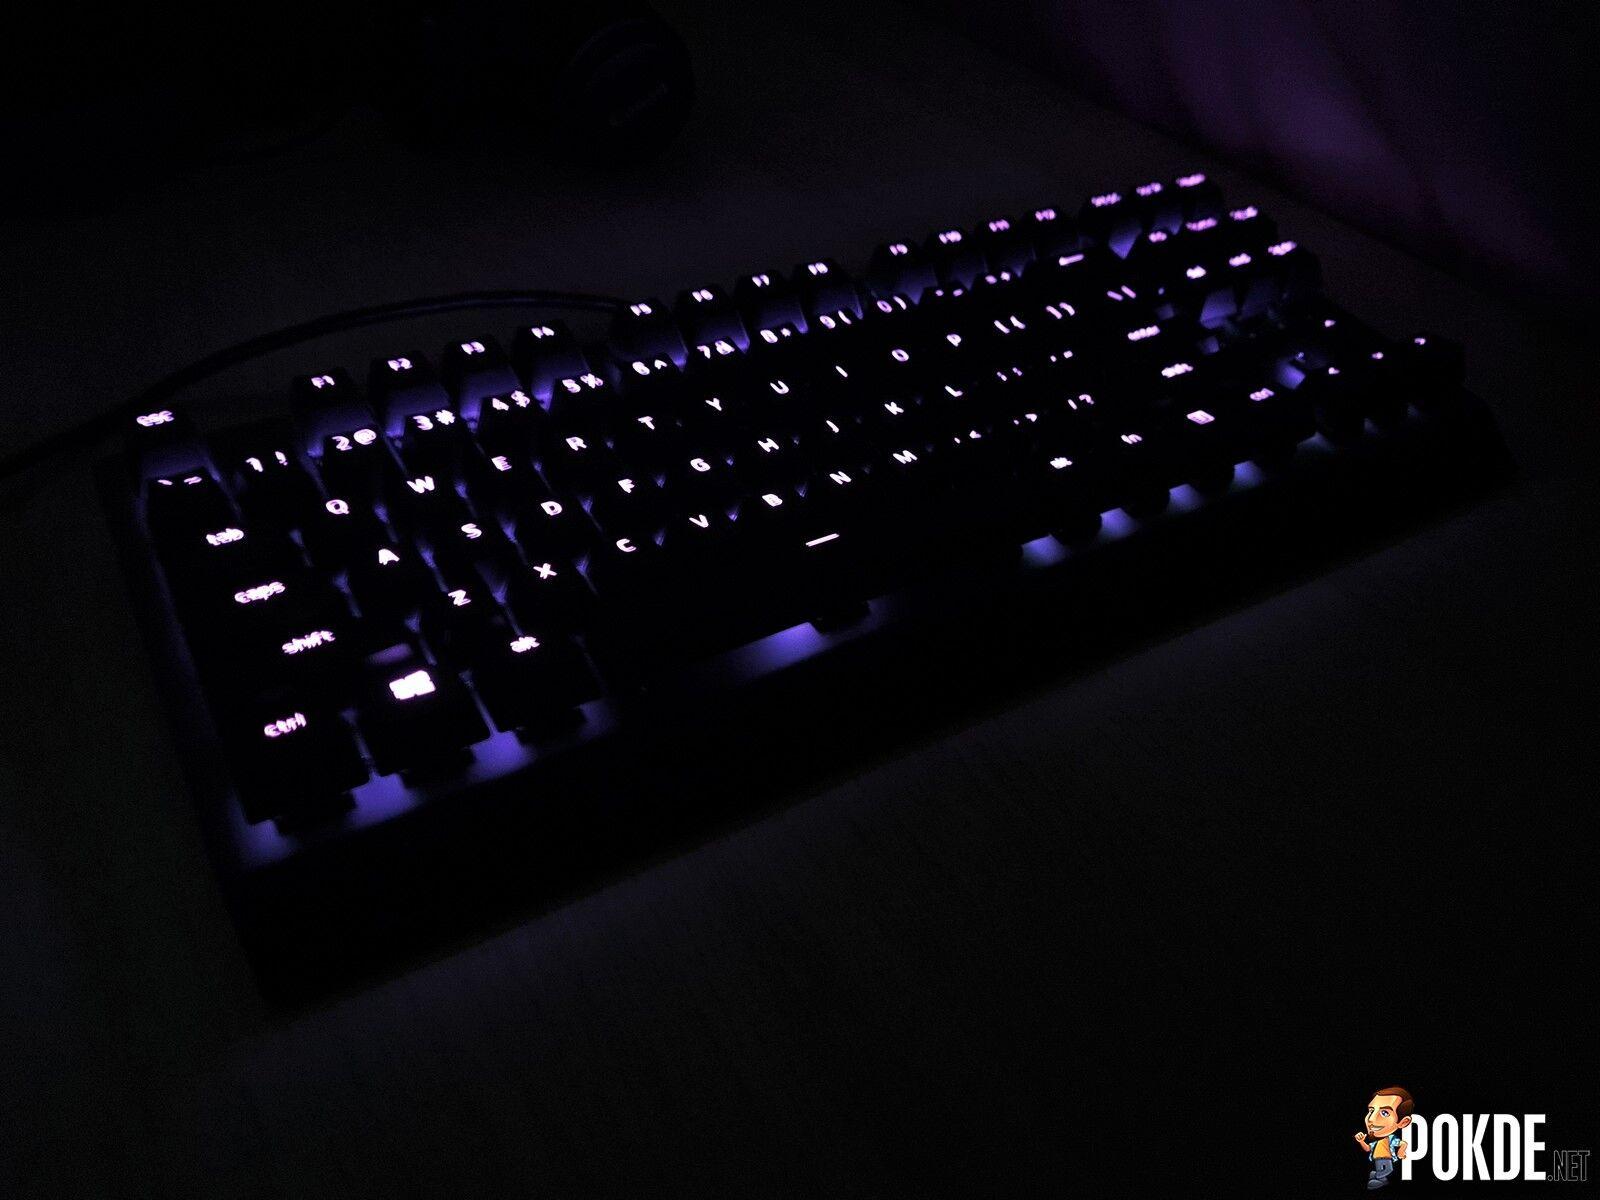 Razer BlackWidow V3 TKL Review - Simplicity Can Be a Pricey Key 27